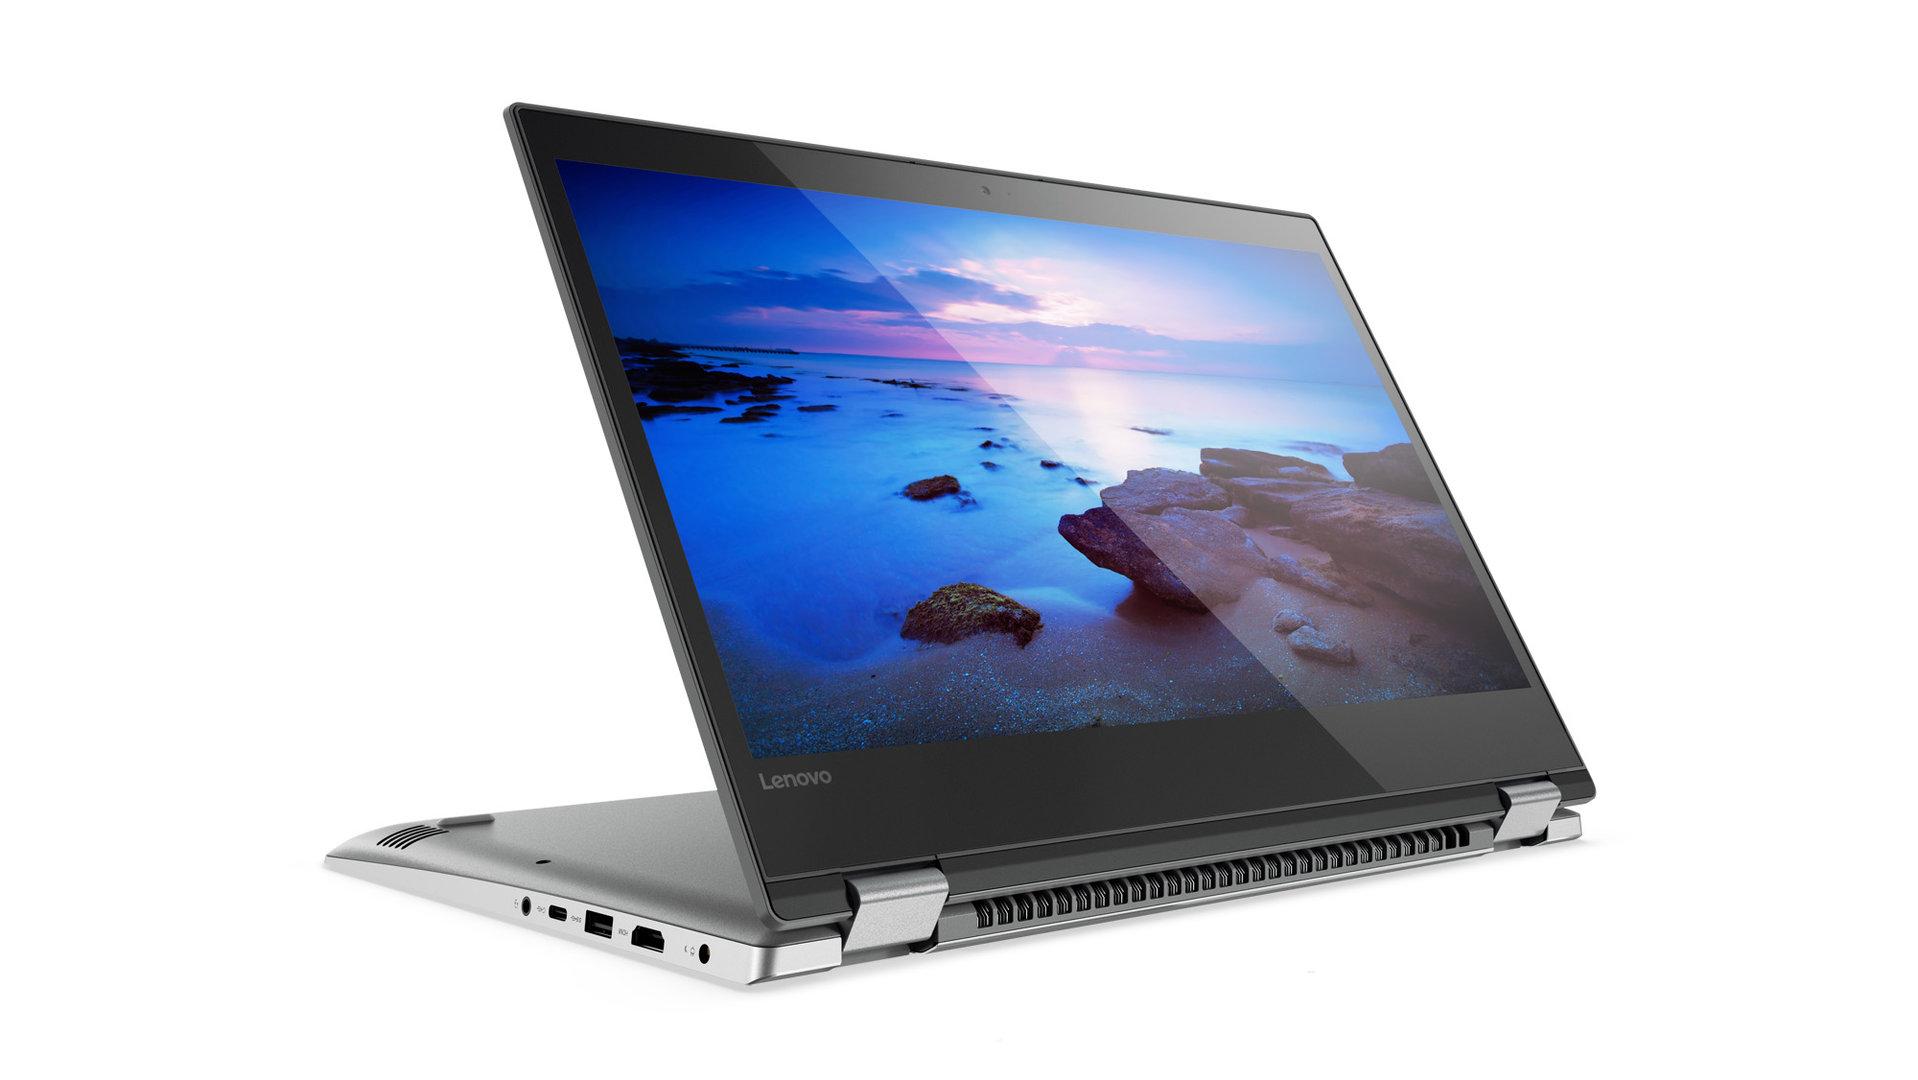 Lenovo Yoga 520 (14 Zoll) in Grau